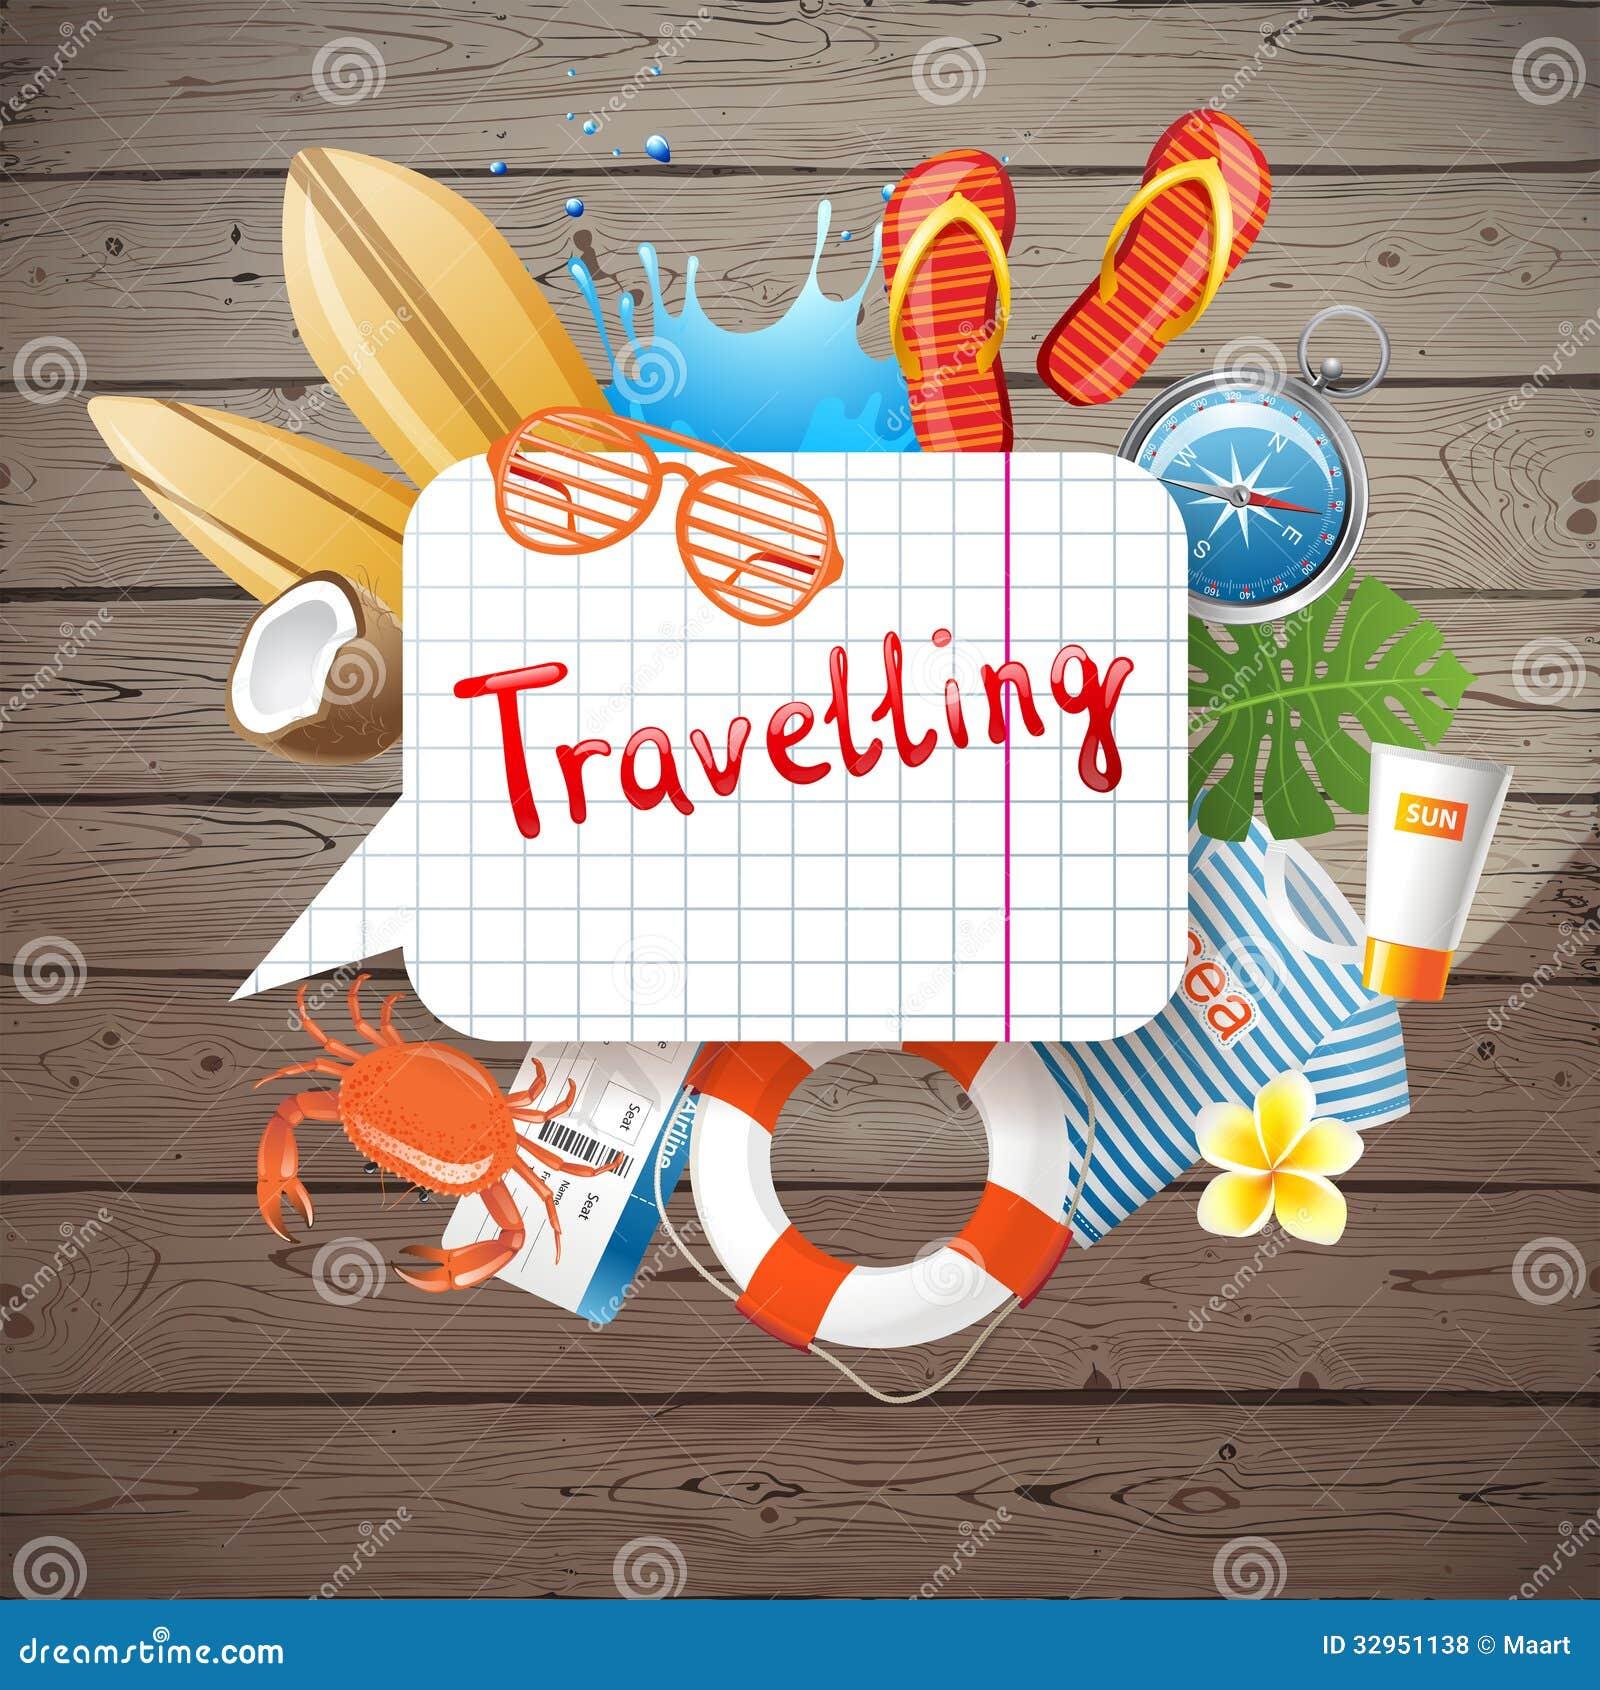 travelling-background-bright-illustration-over-wooden-32951138.jpg